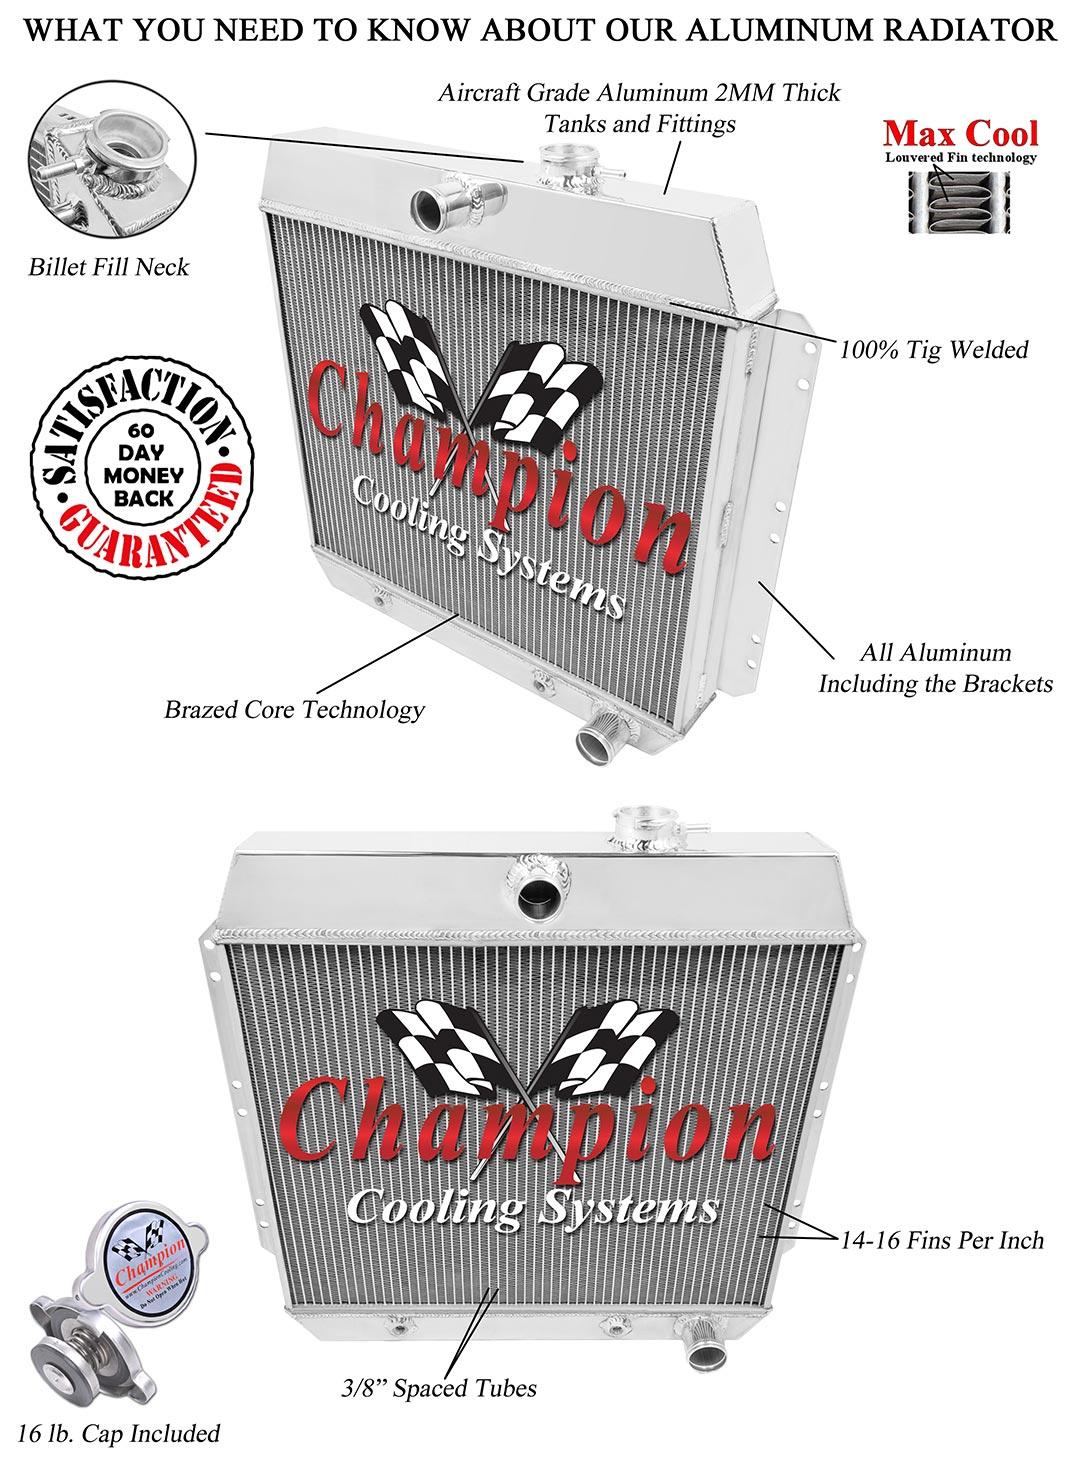 4 Row Kool Champion Radiator for 1949 1950 1951 1952 1953 Ford Cars Chevy Engine